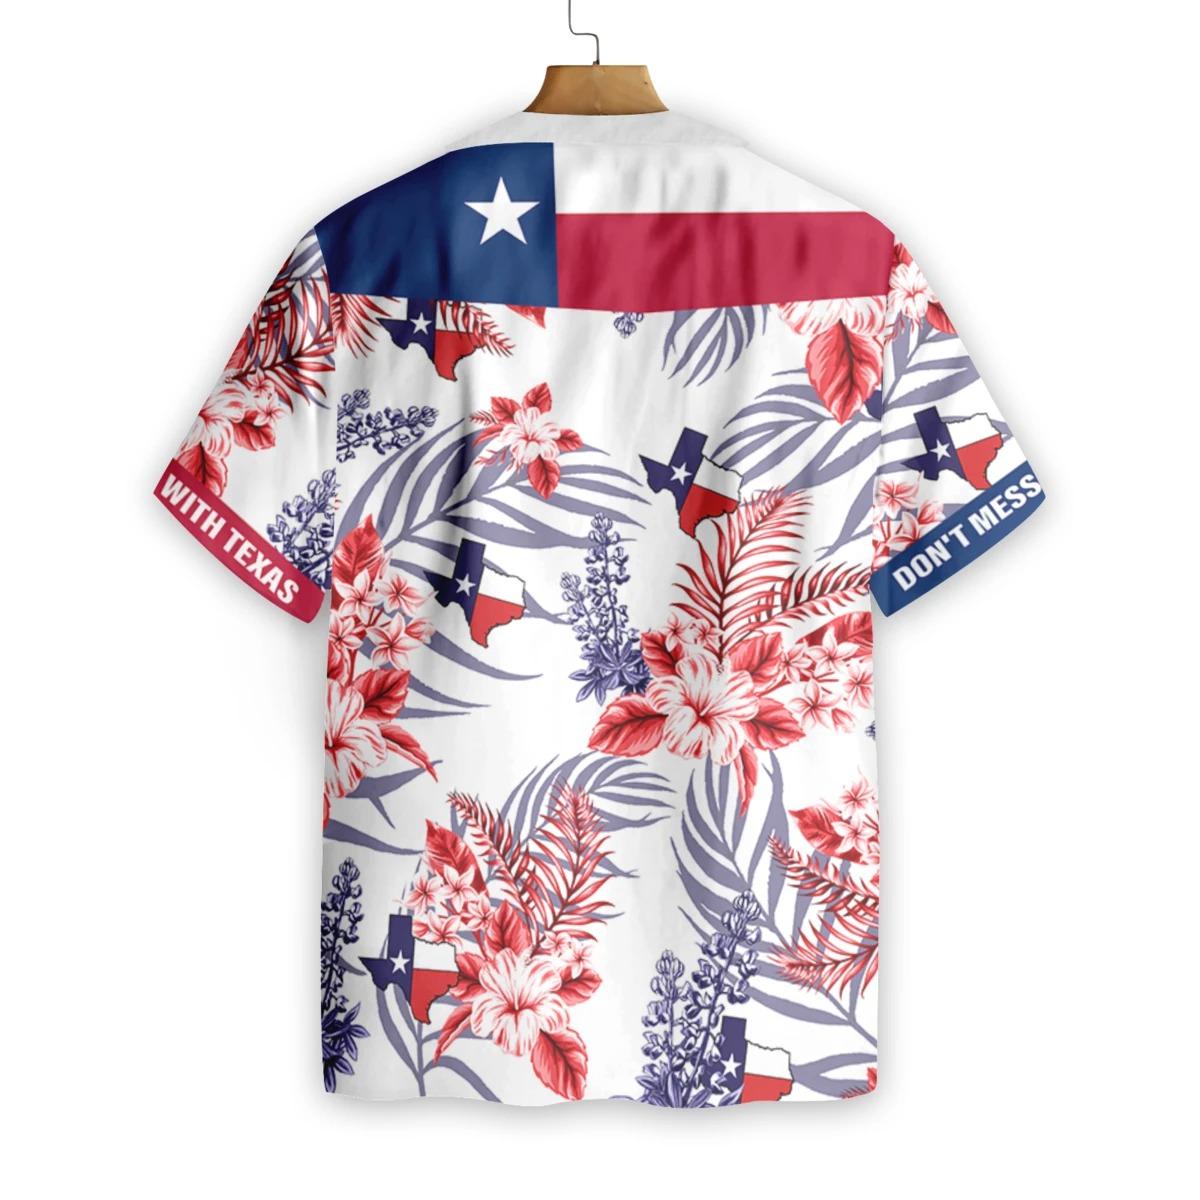 Dont mess with texas hawaiian shirt2